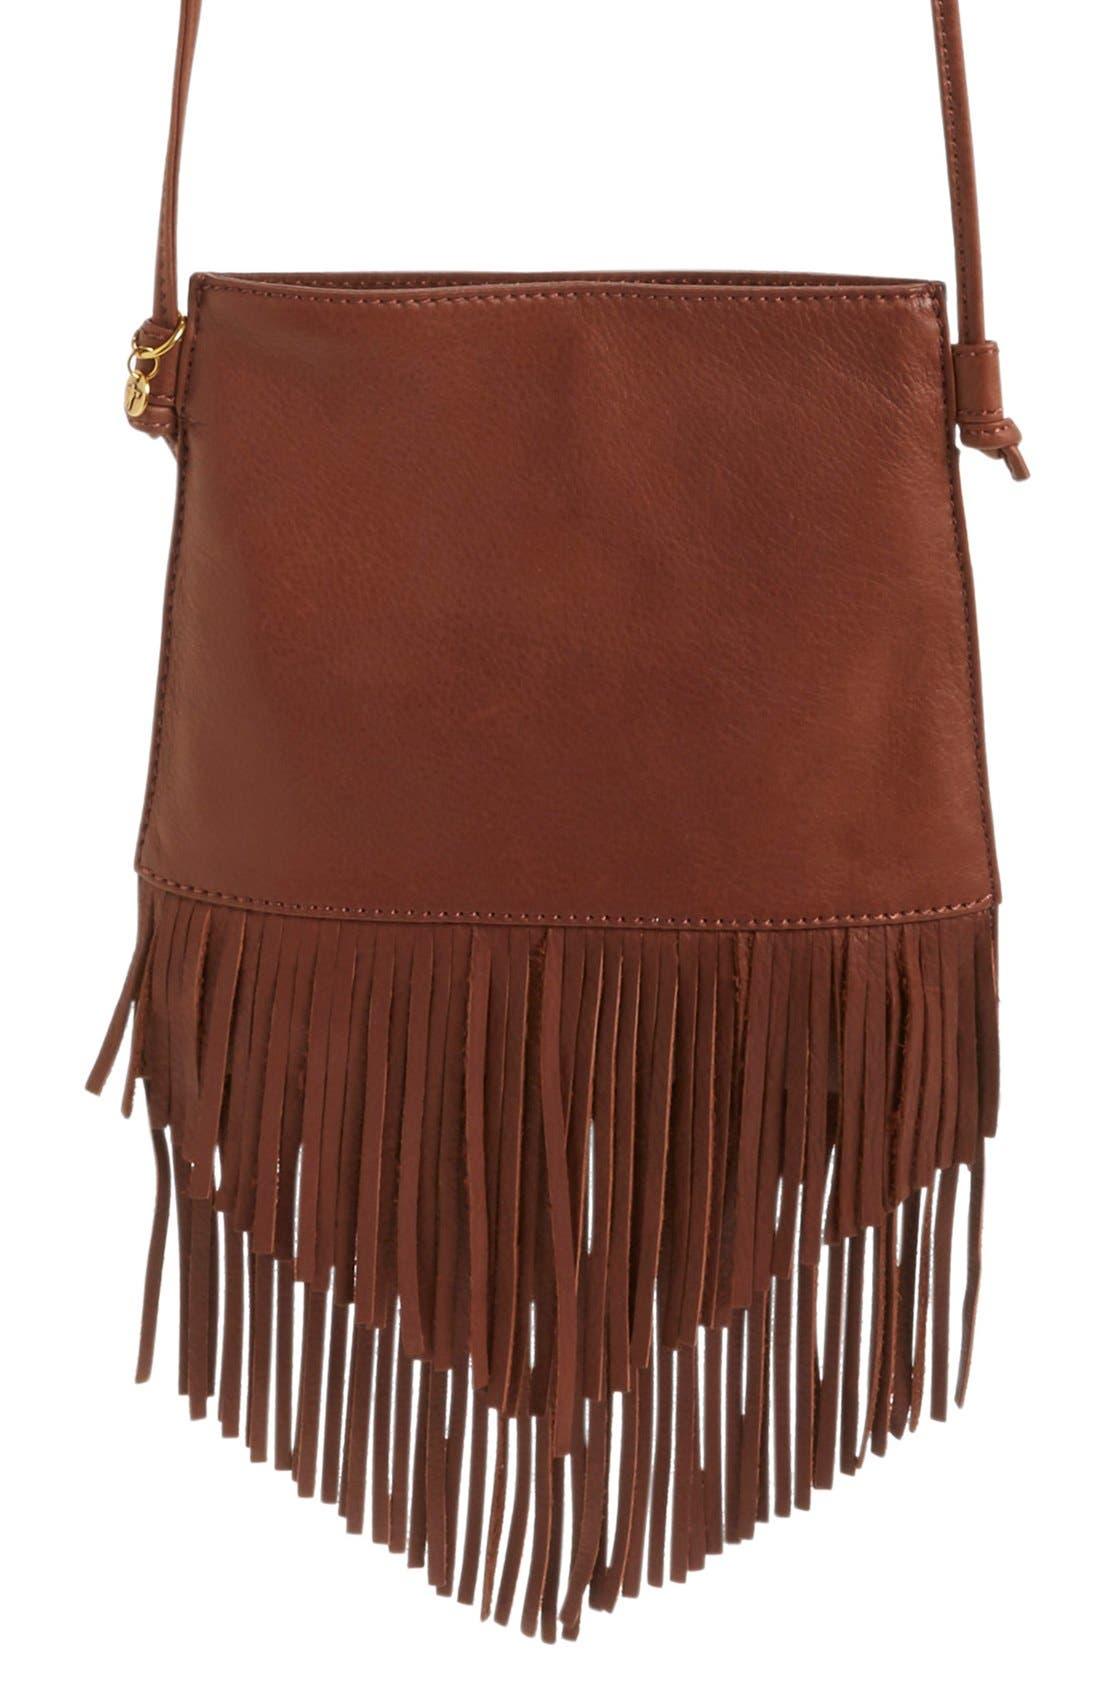 Main Image - Hobo 'Meadow' Crossbody Bag